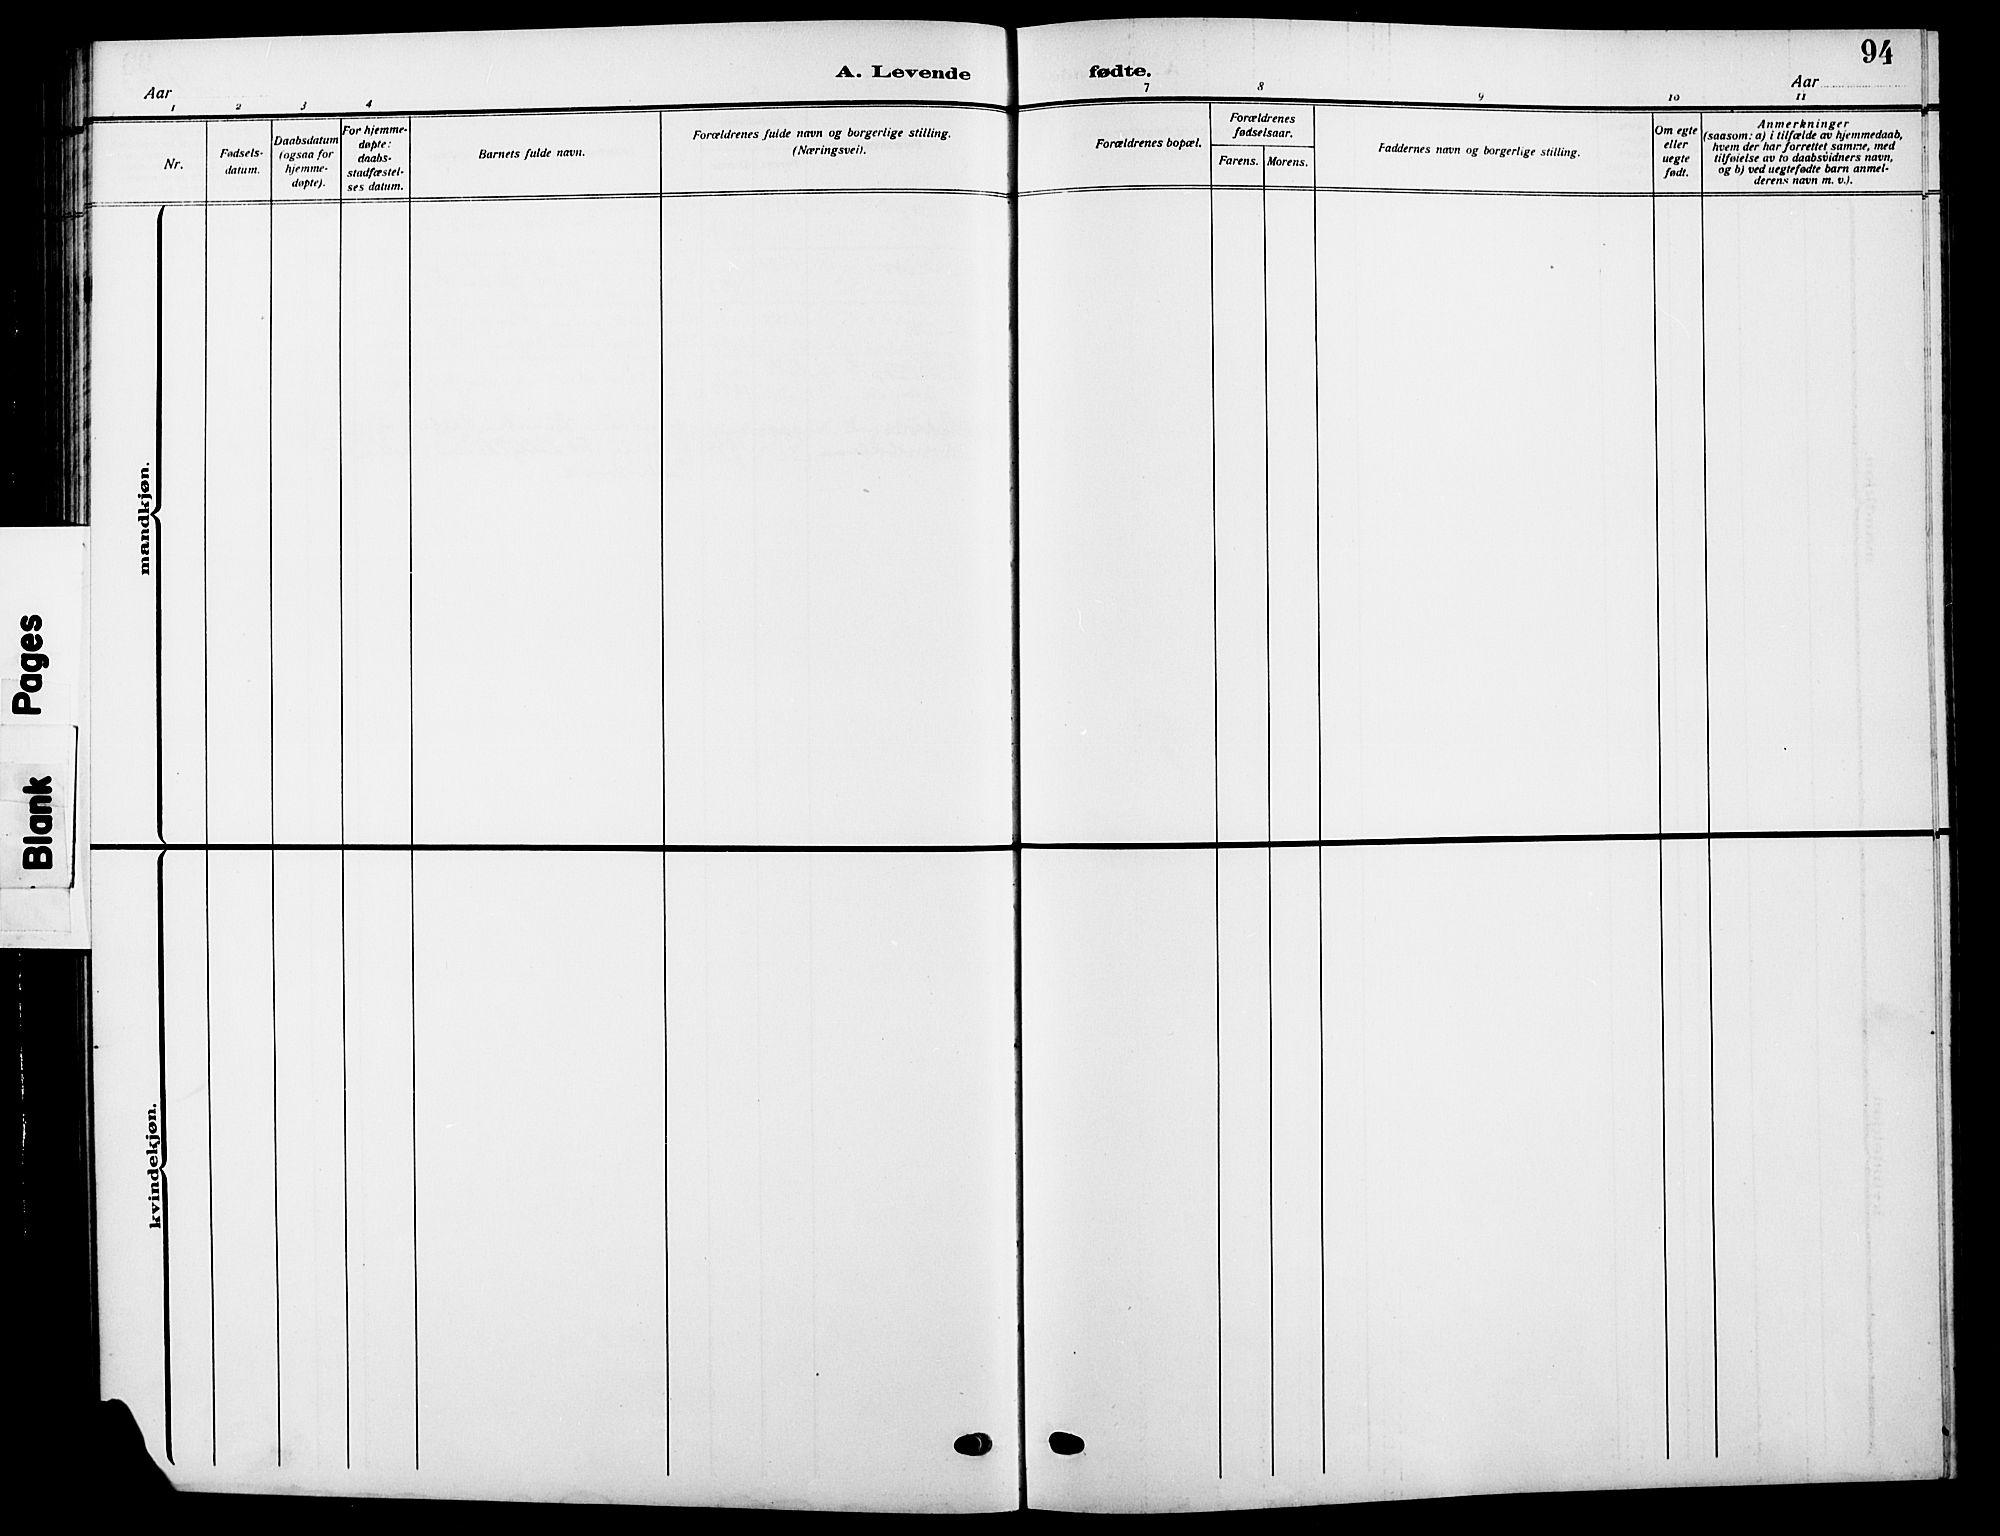 SAH, Vardal prestekontor, H/Ha/Hab/L0014: Klokkerbok nr. 14, 1911-1922, s. 94